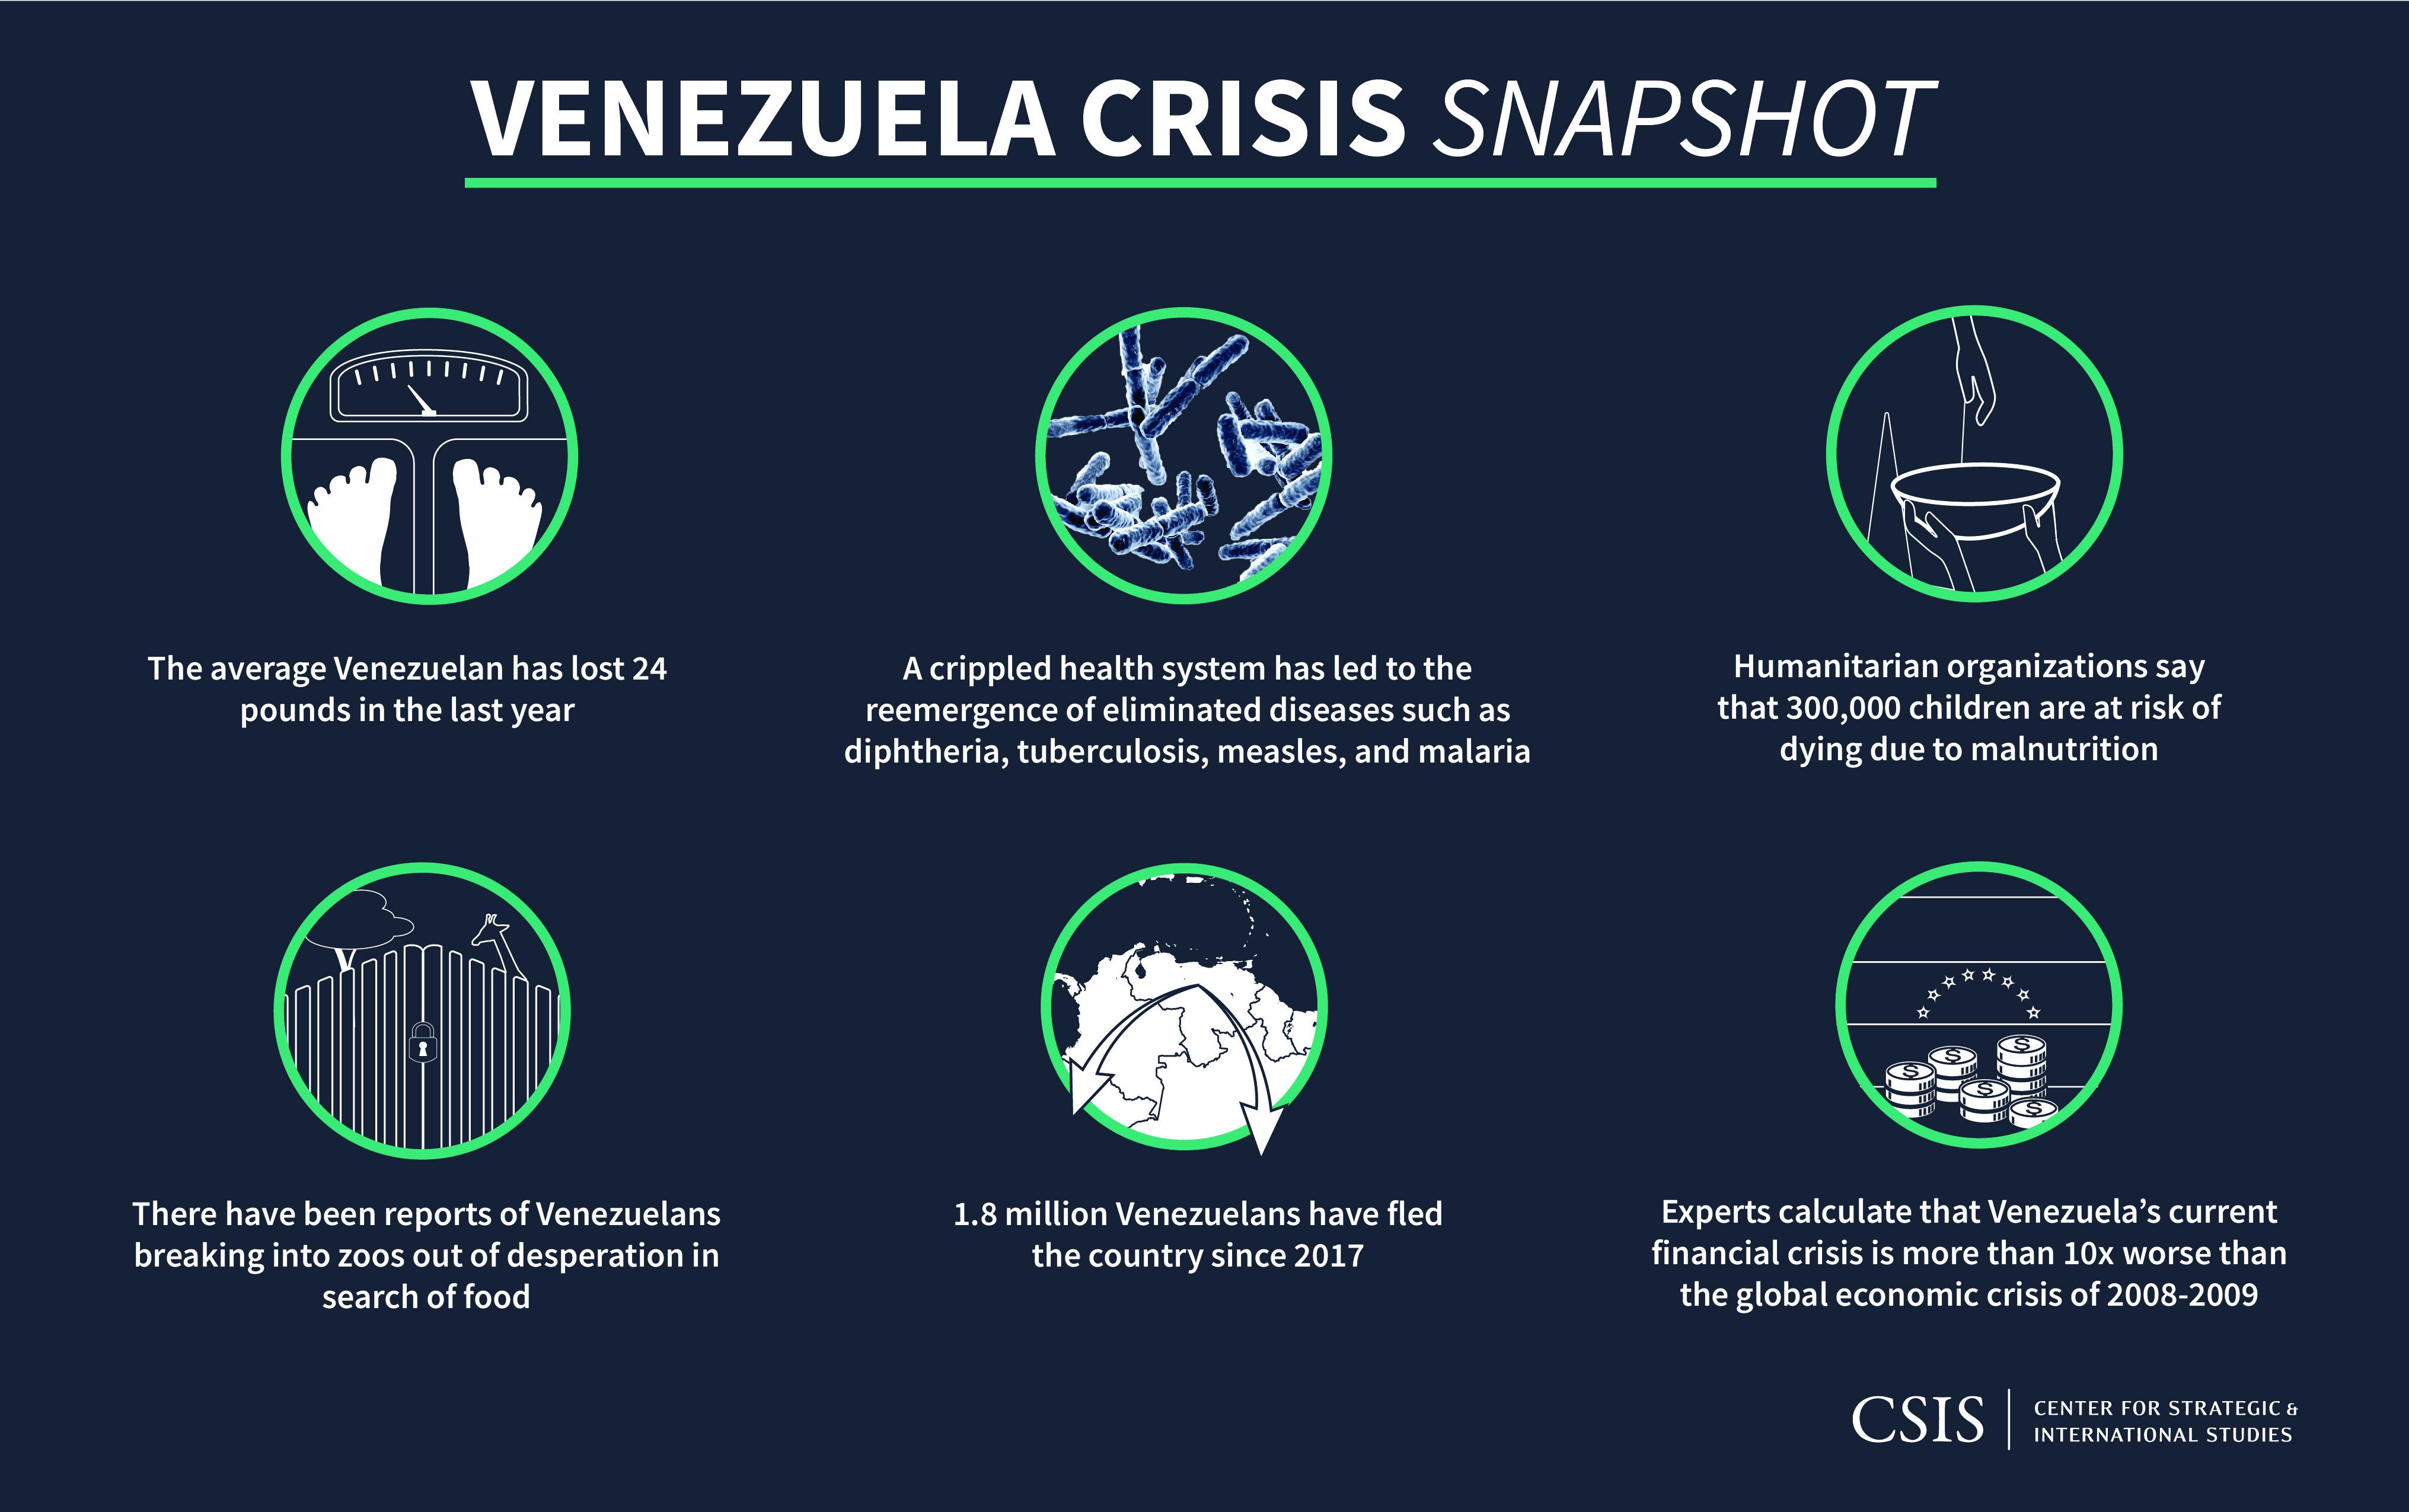 https://csis-website-prod.s3.amazonaws.com/s3fs-public/180709_VenezualaCrisis_snapshot_Final.jpg?txqhaCiYhhTnT.s7dc_EvNZU94NgsNrx